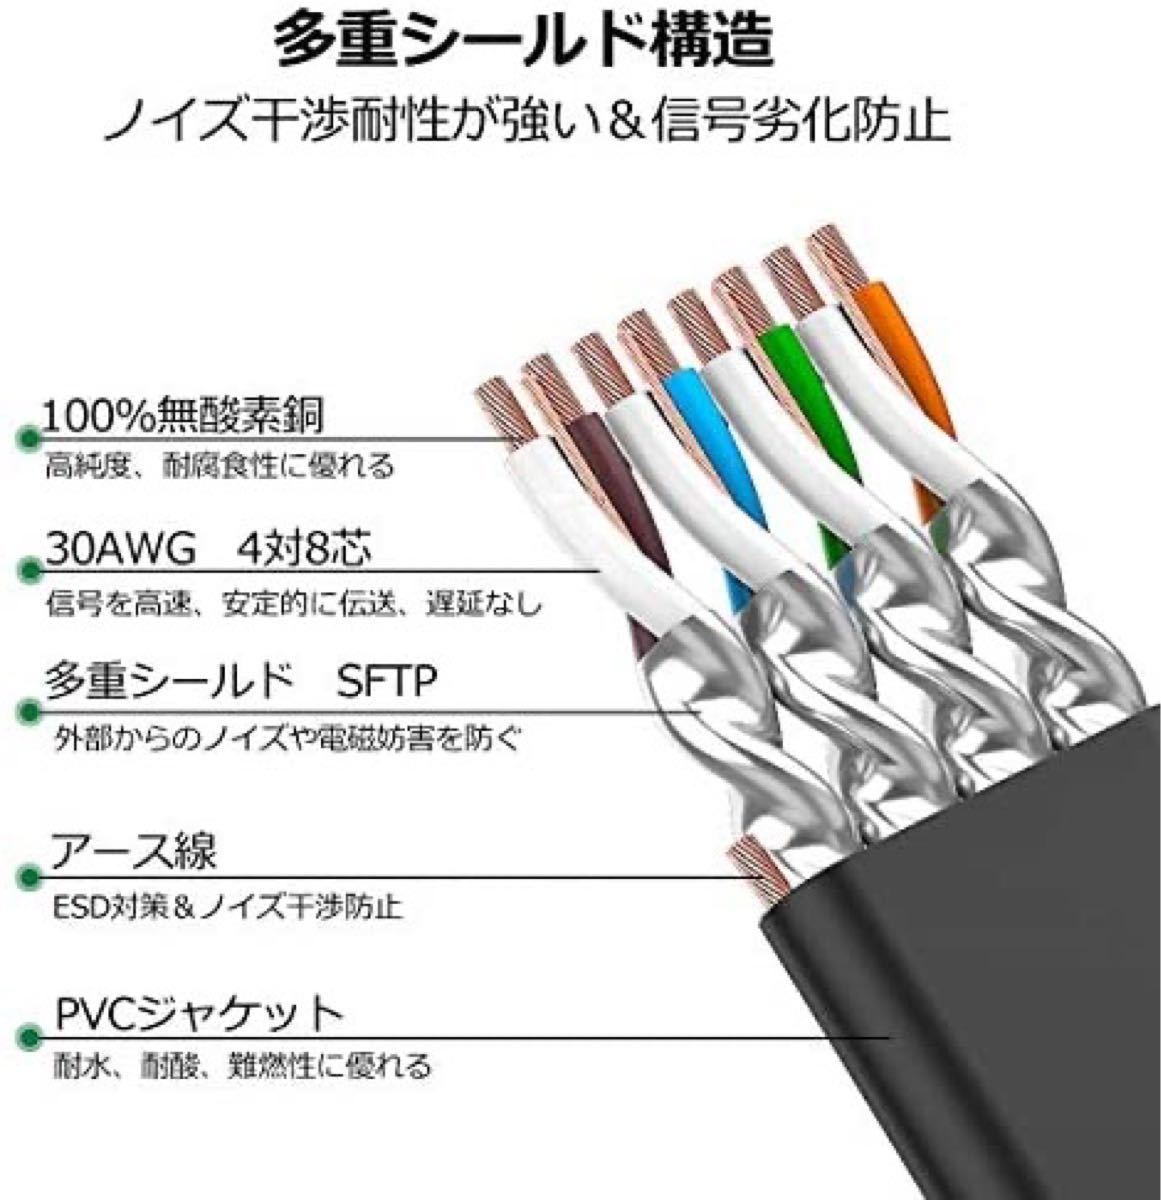 LANケーブル超高速 CAT8 40Gbps 2000MHz対応長さ(10M